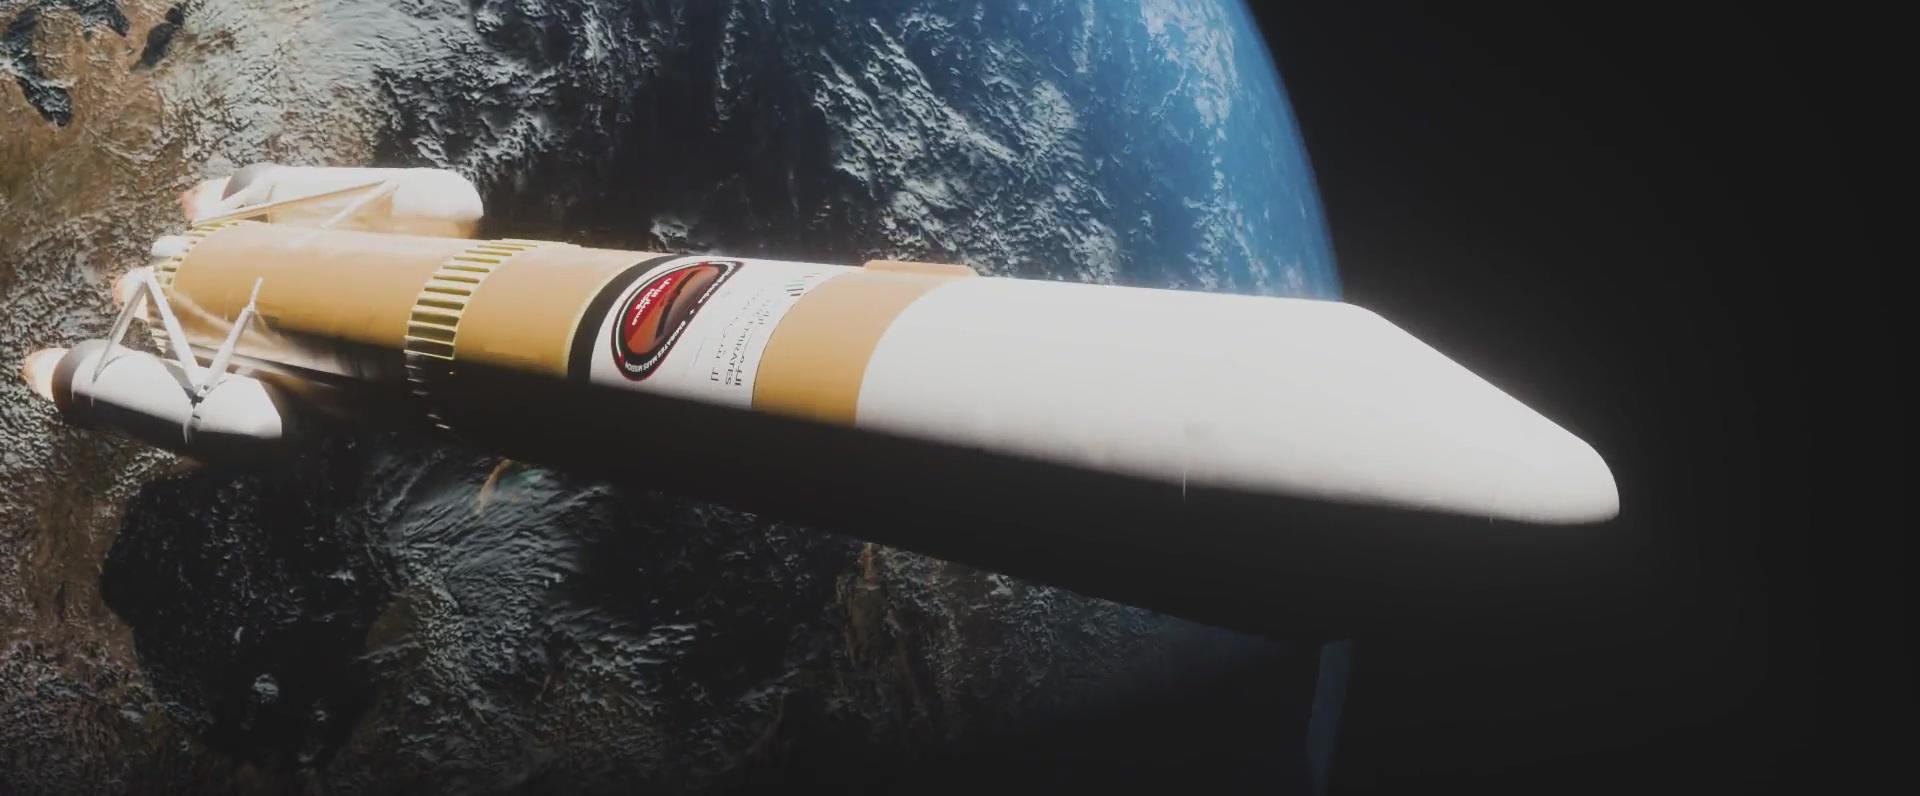 Mohammed Bin Rashid Space Centre - Hope Probe 20 July 2020 - Eng - 150S Full - Ajax Creative-1-2